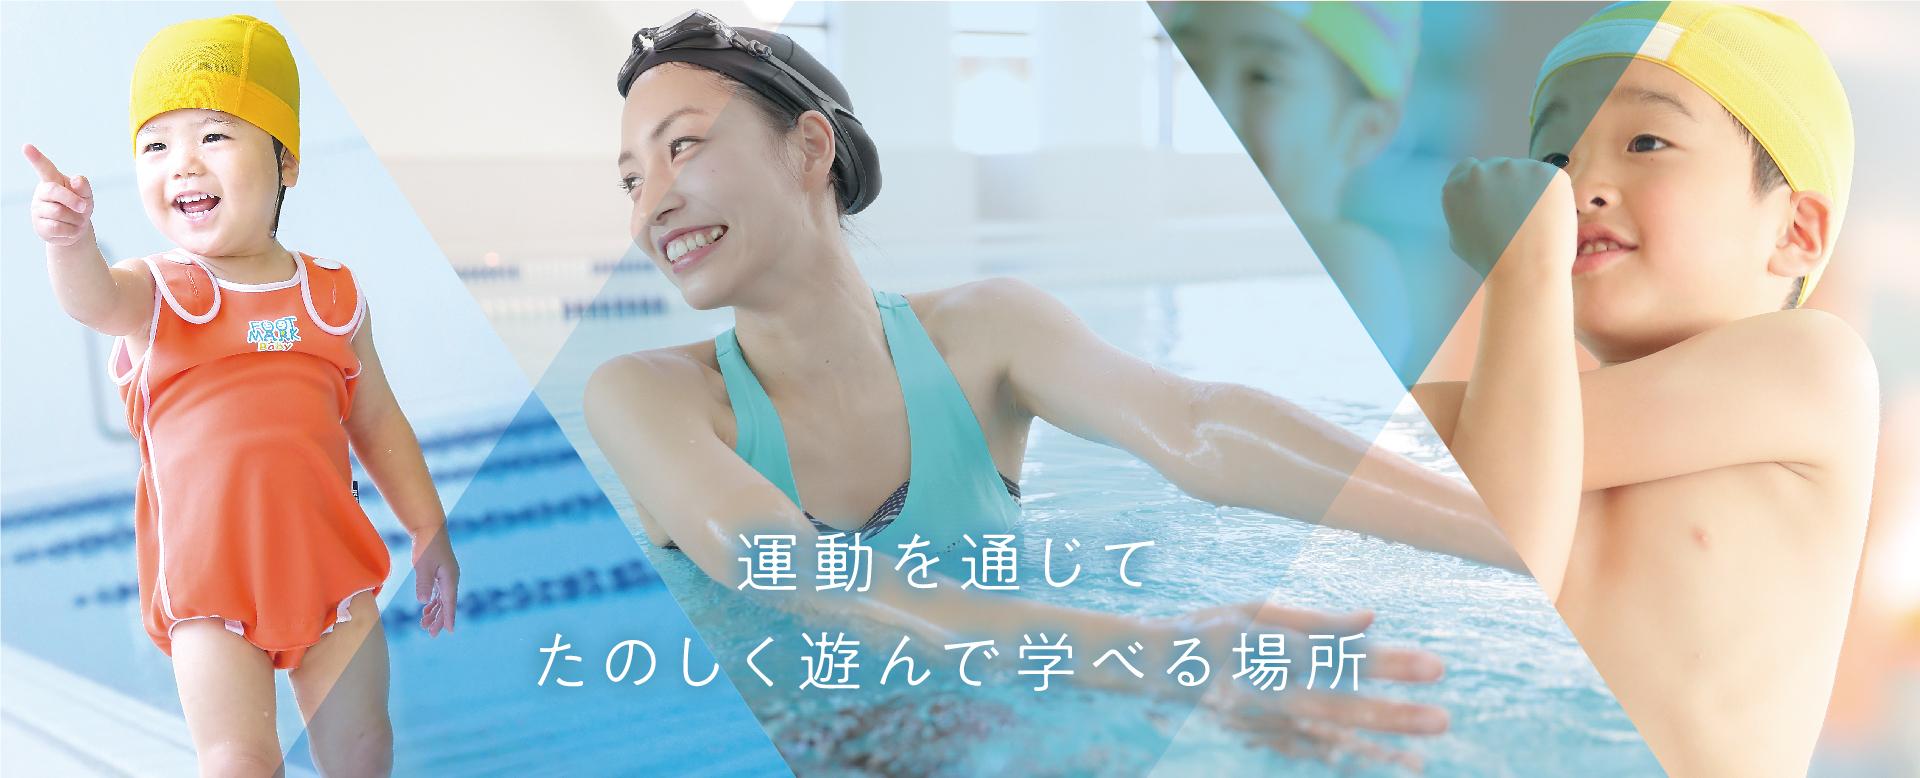 Gunzesports toyama グンゼスポーツ 富山市民プラザ